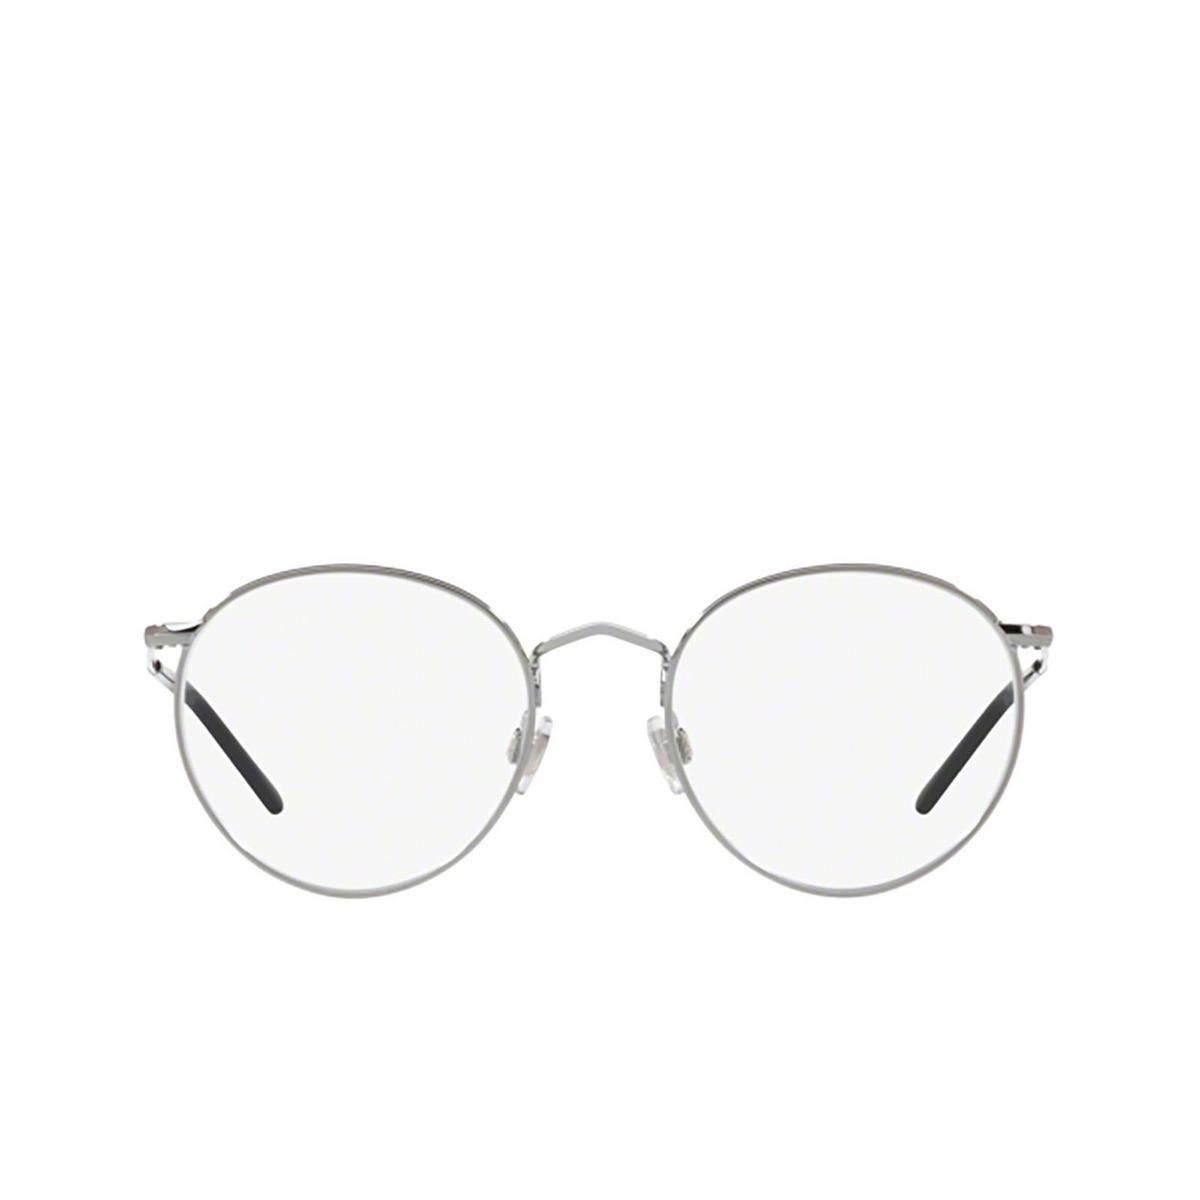 Polo Ralph Lauren® Round Eyeglasses: PH1179 color Shiny Gunmetal 9002.